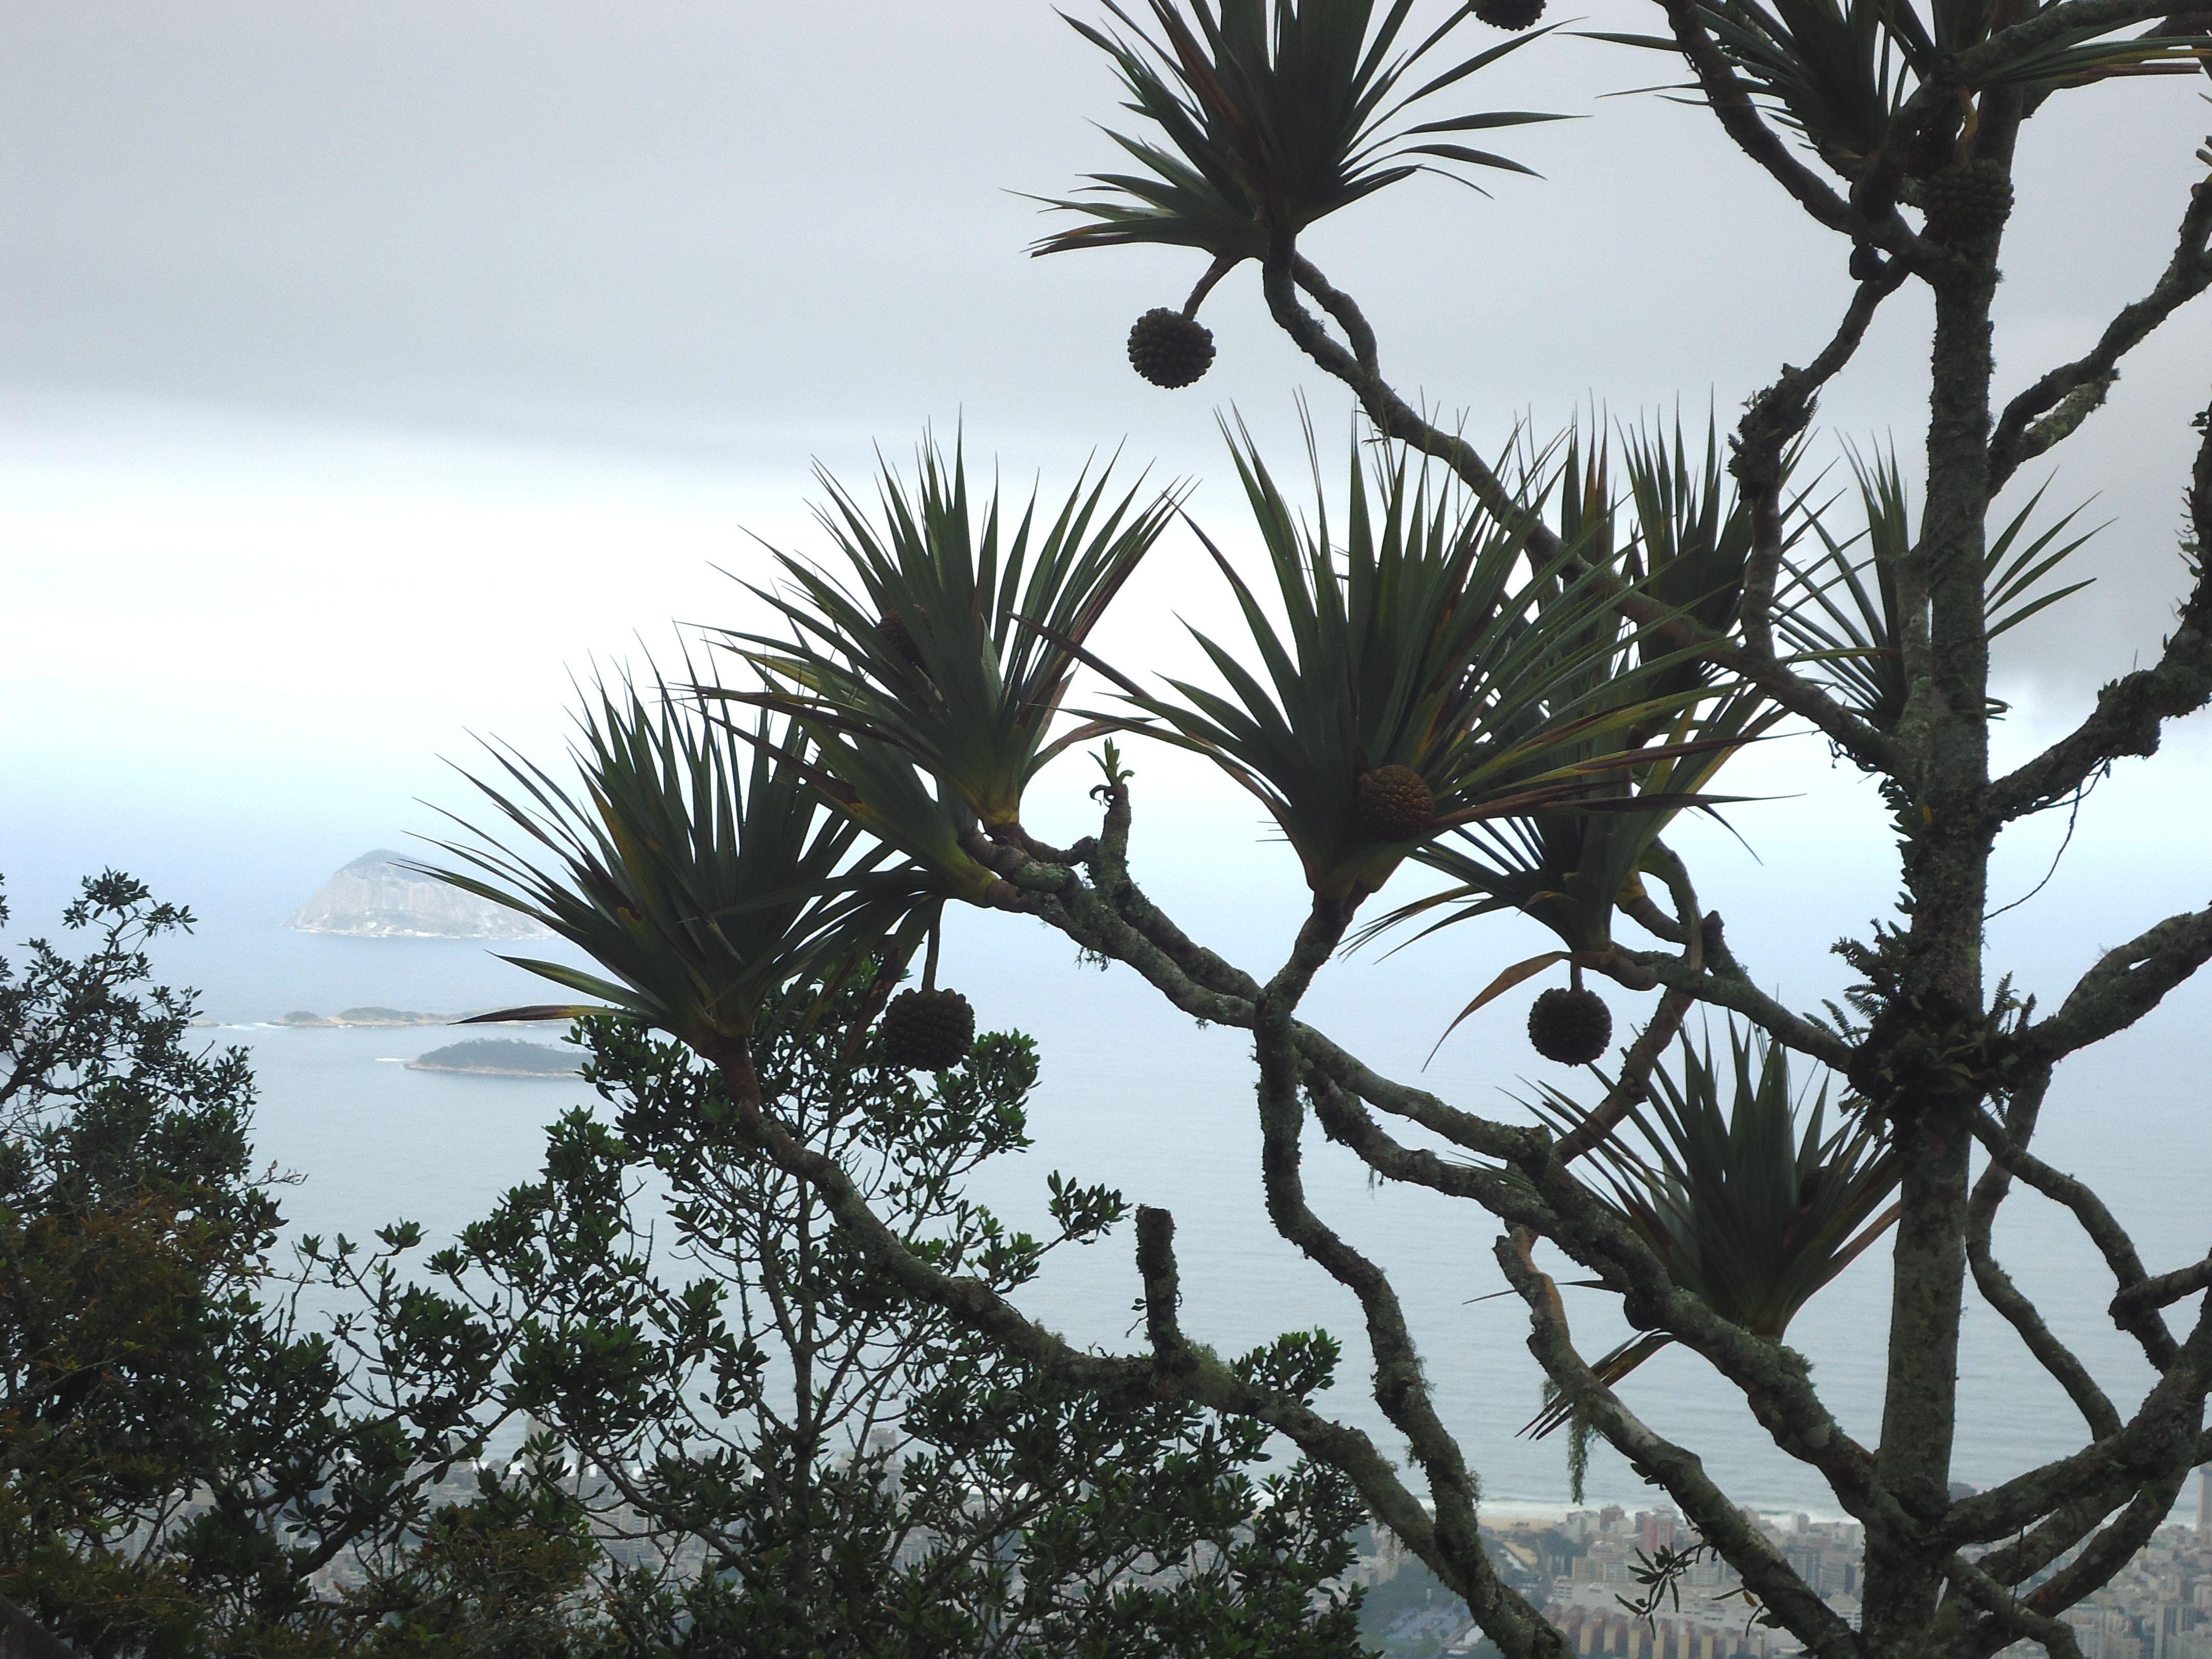 Floresta da Tijuca no alto da Boa Vista - Corcovado / 2014